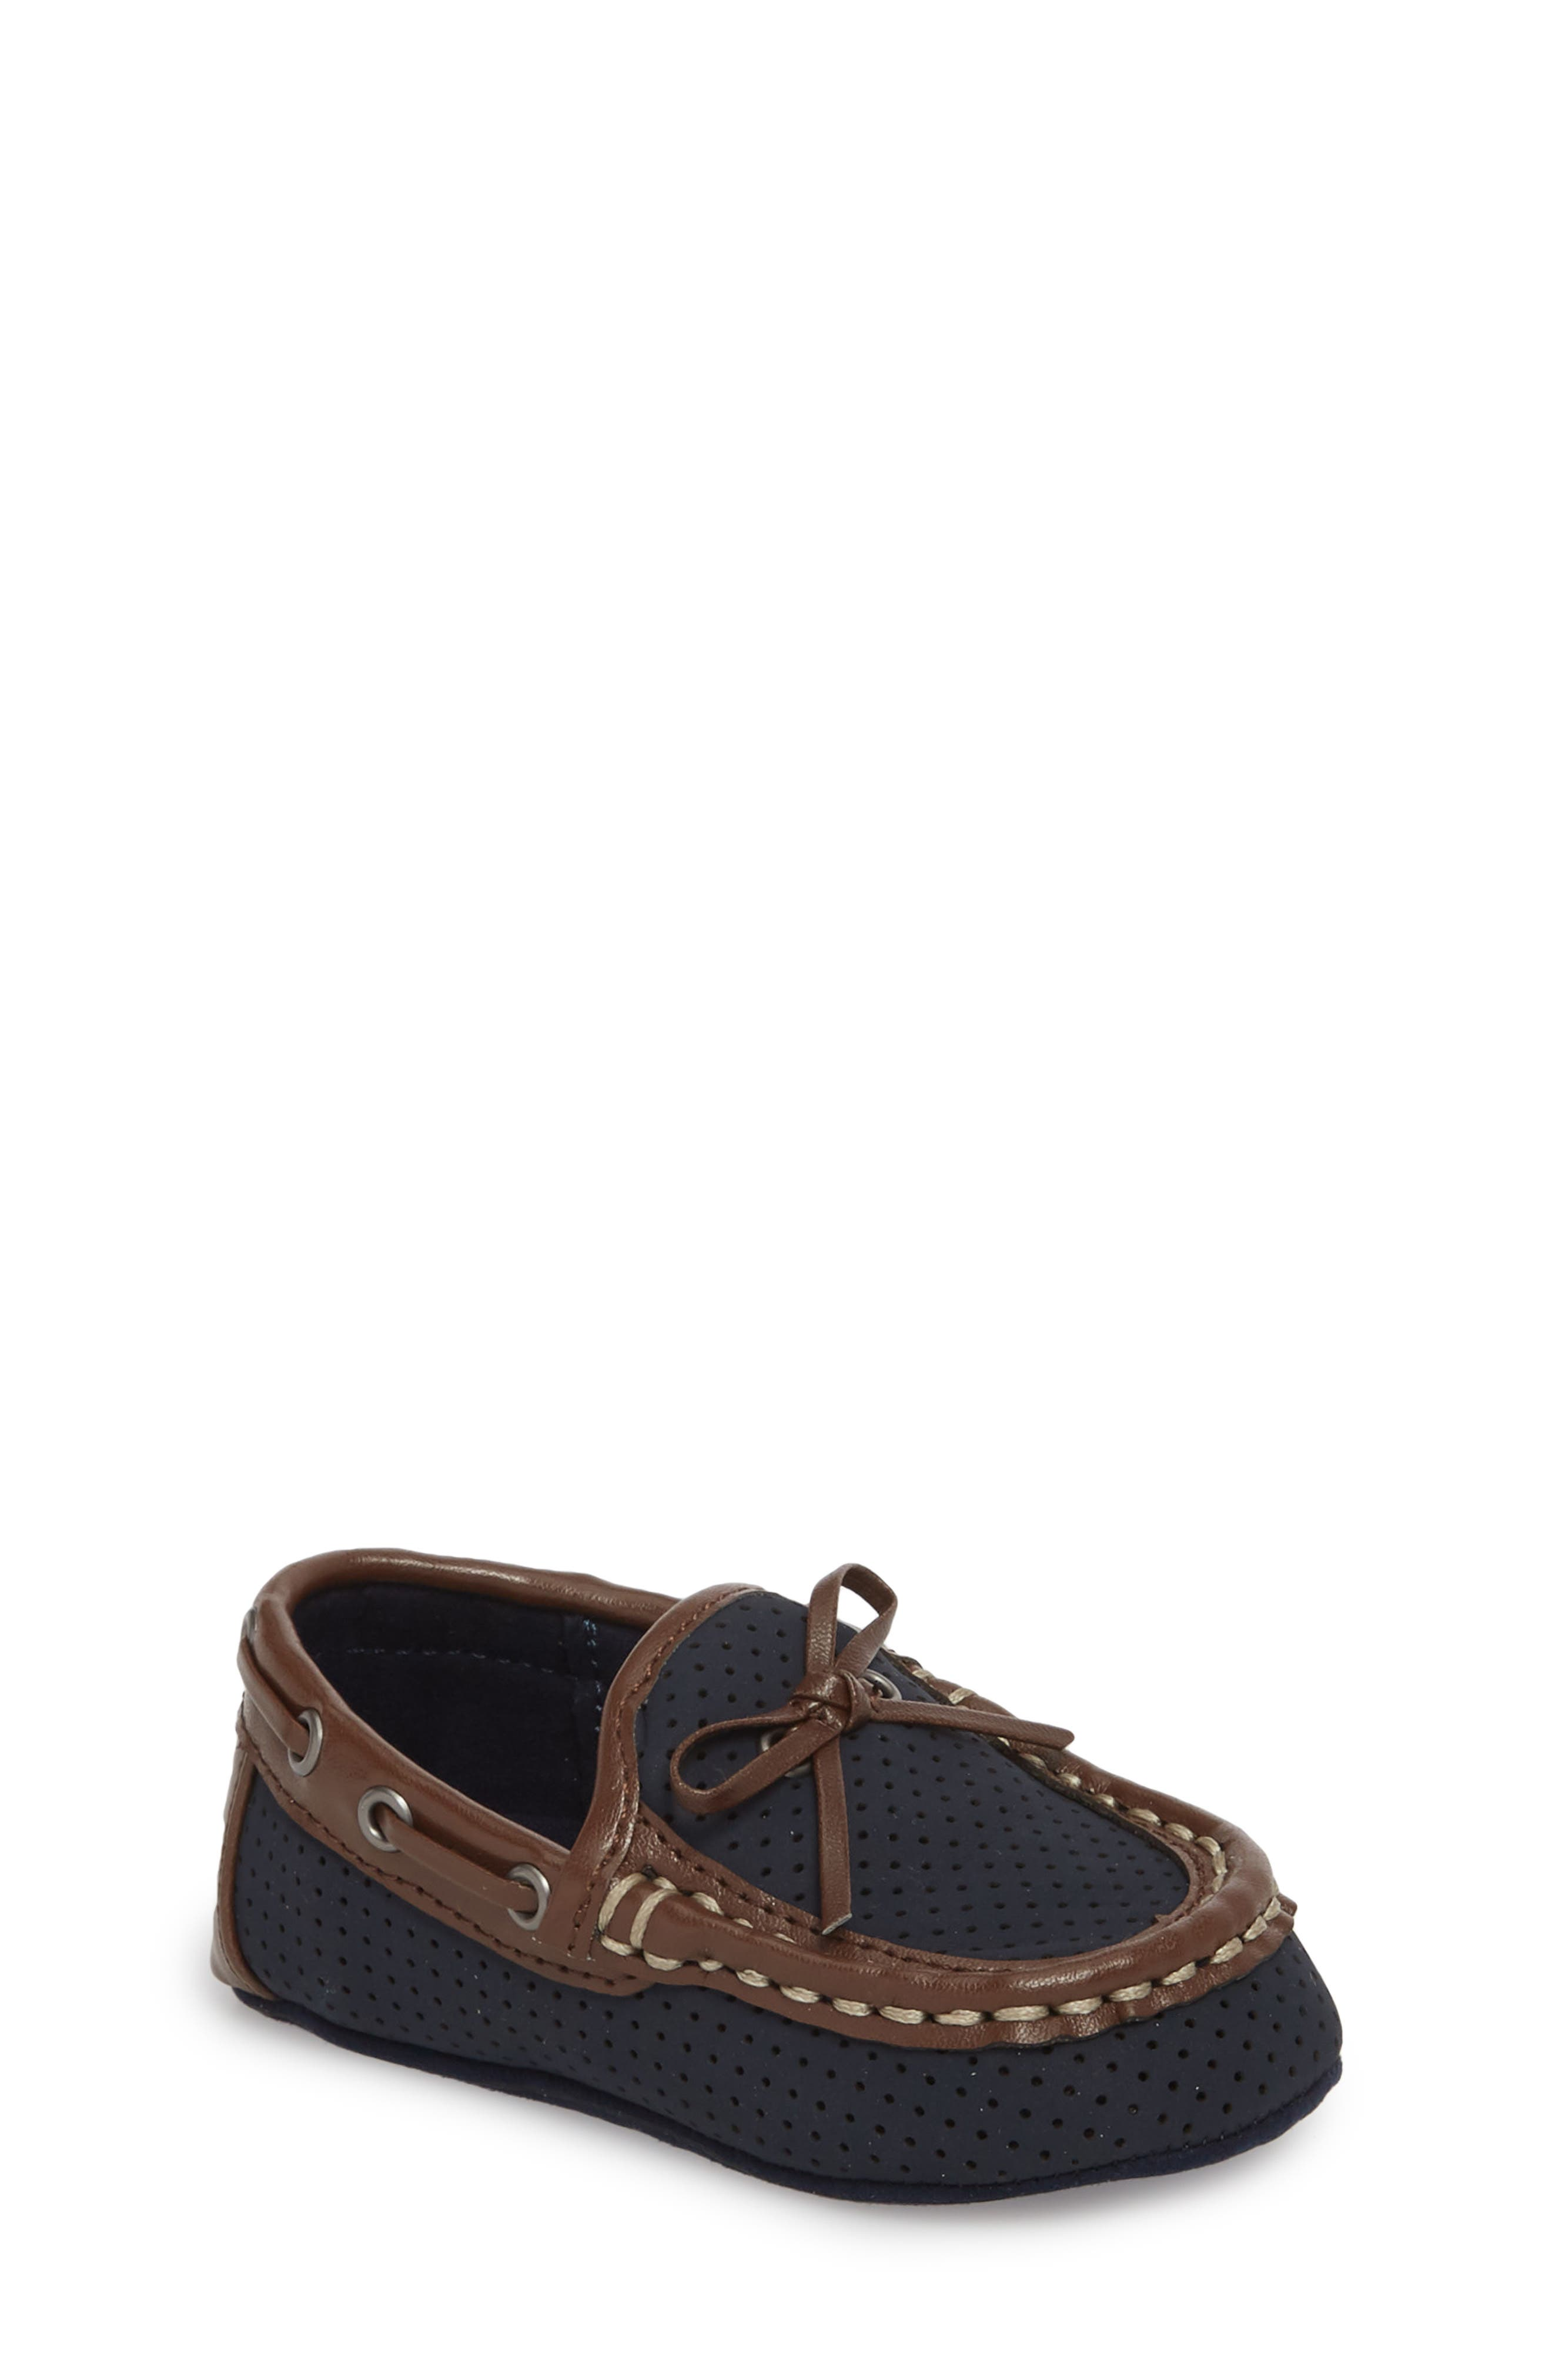 Boat Shoe,                             Main thumbnail 1, color,                             410